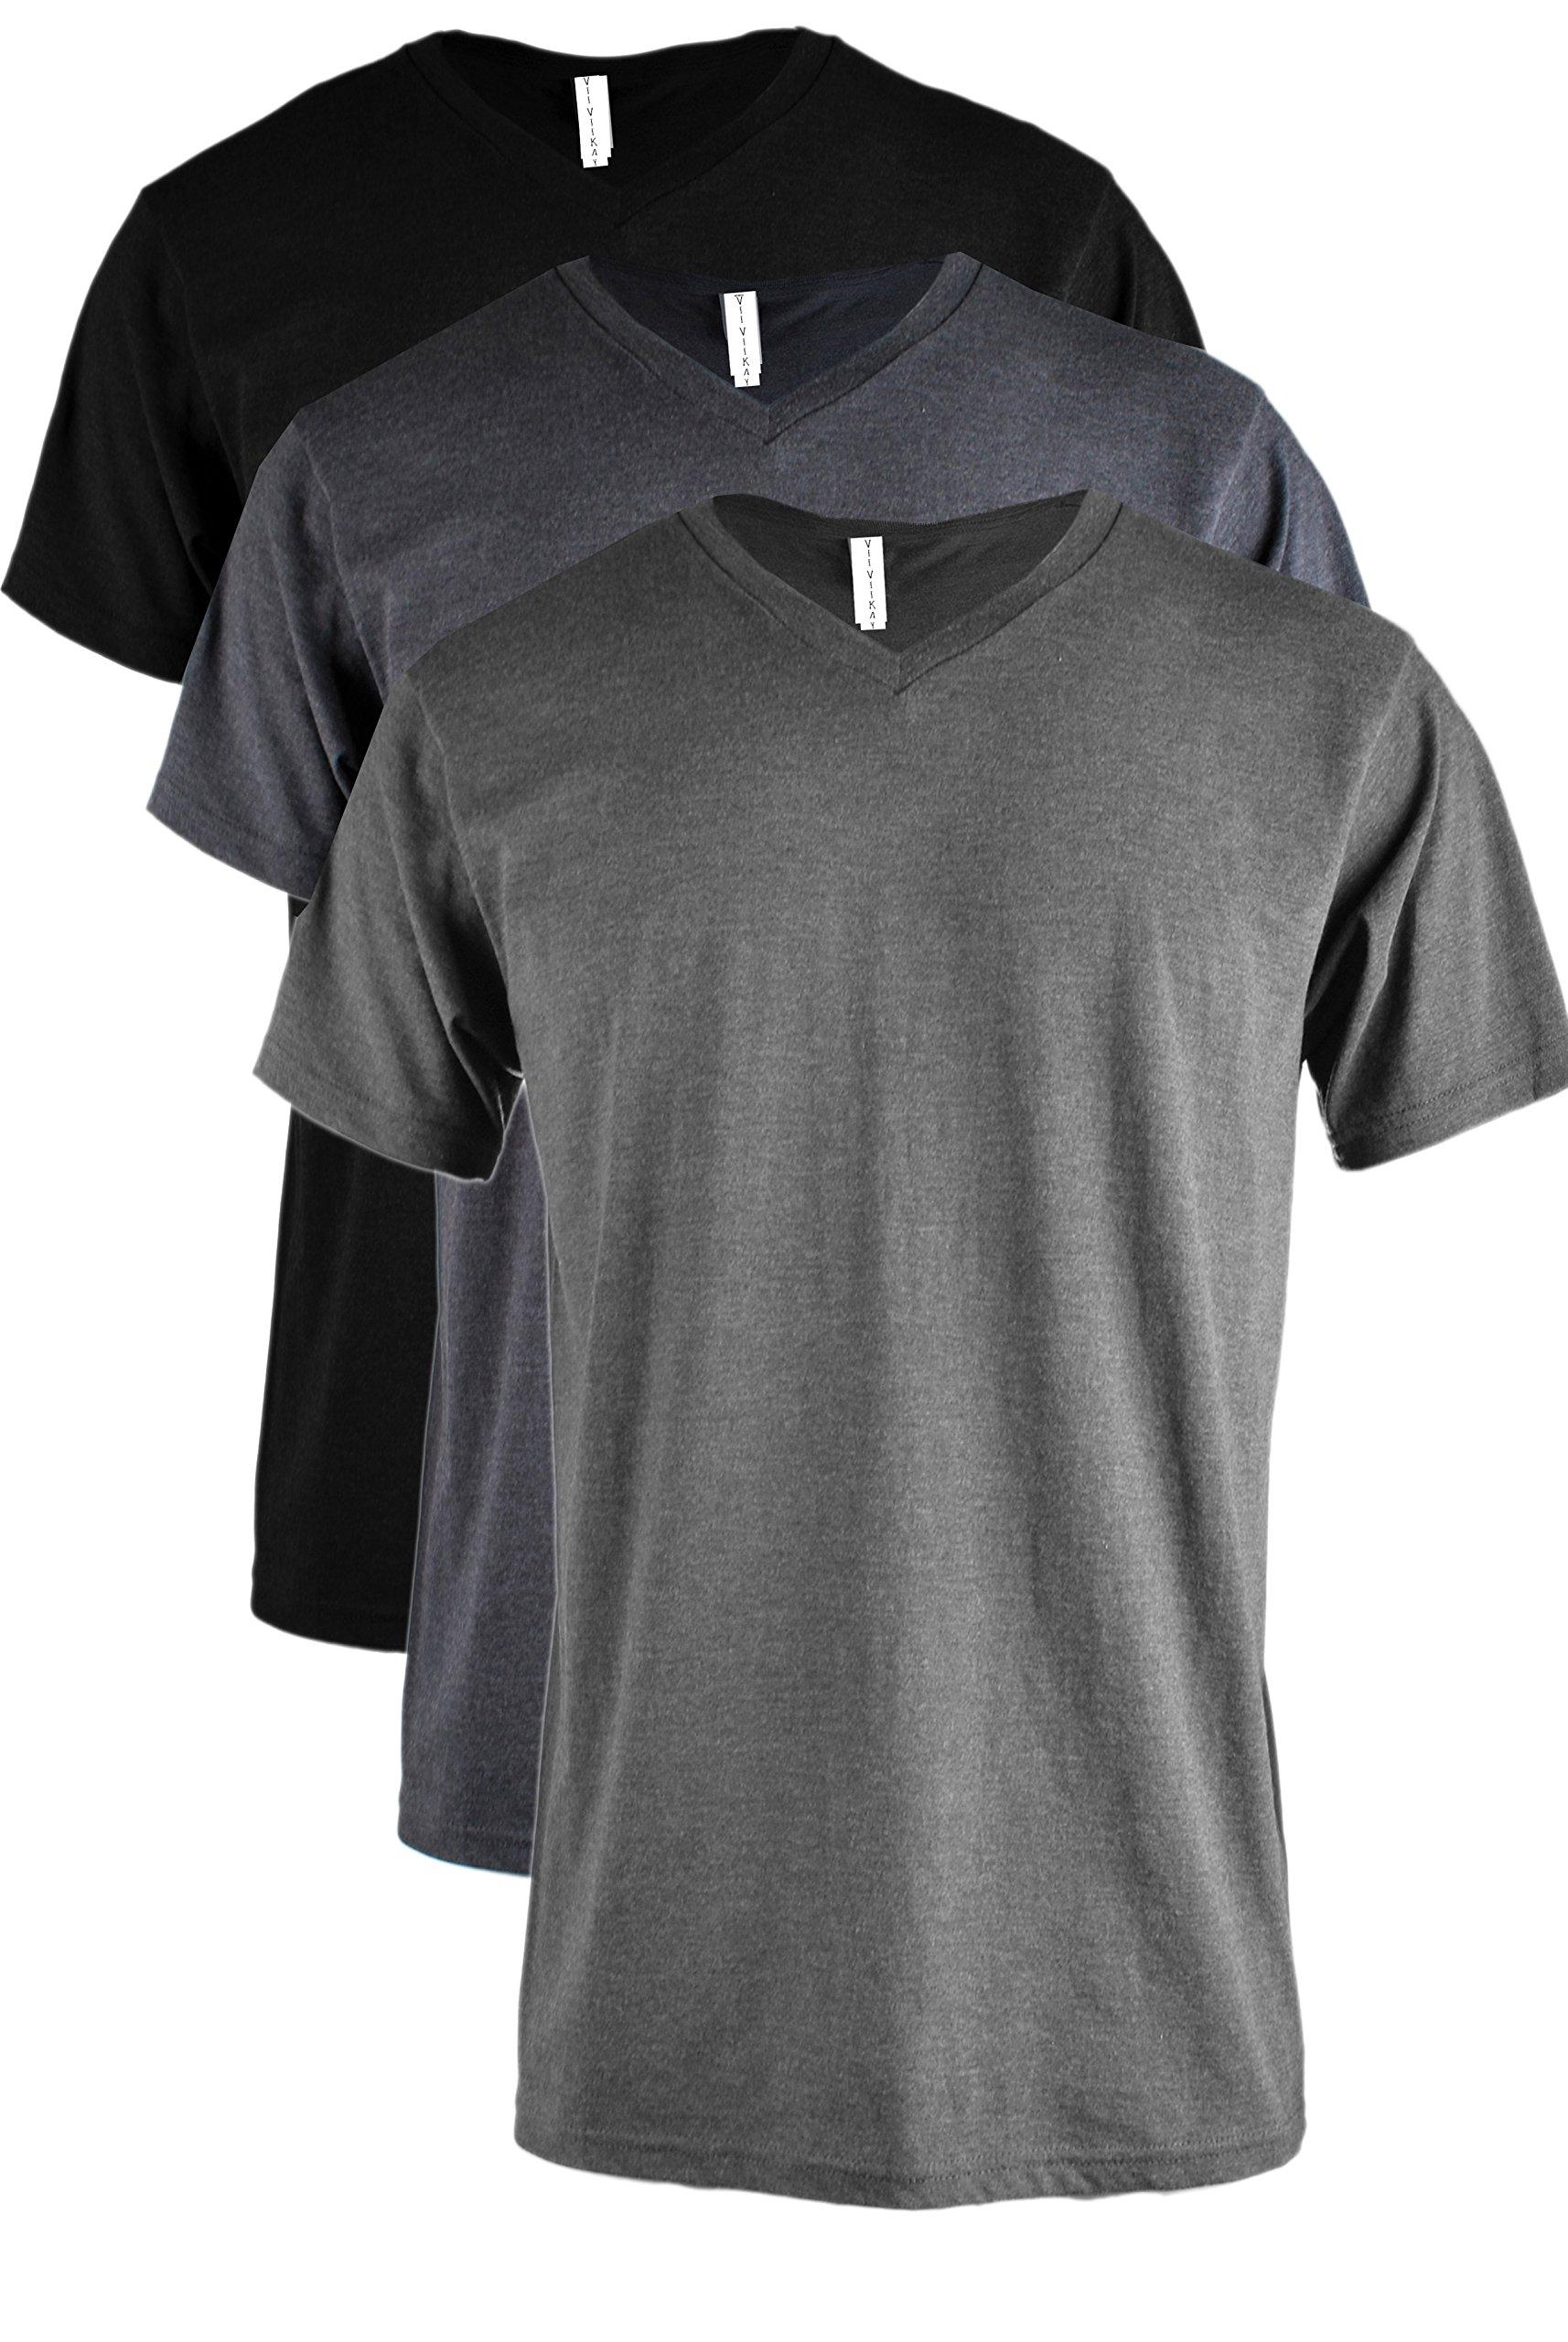 ViiViiKay Mens Short Sleeve Basic Slim Fit Tri-Blend Cotton V Neck T Shirts RVNKSET3_BK_Char_Navy L